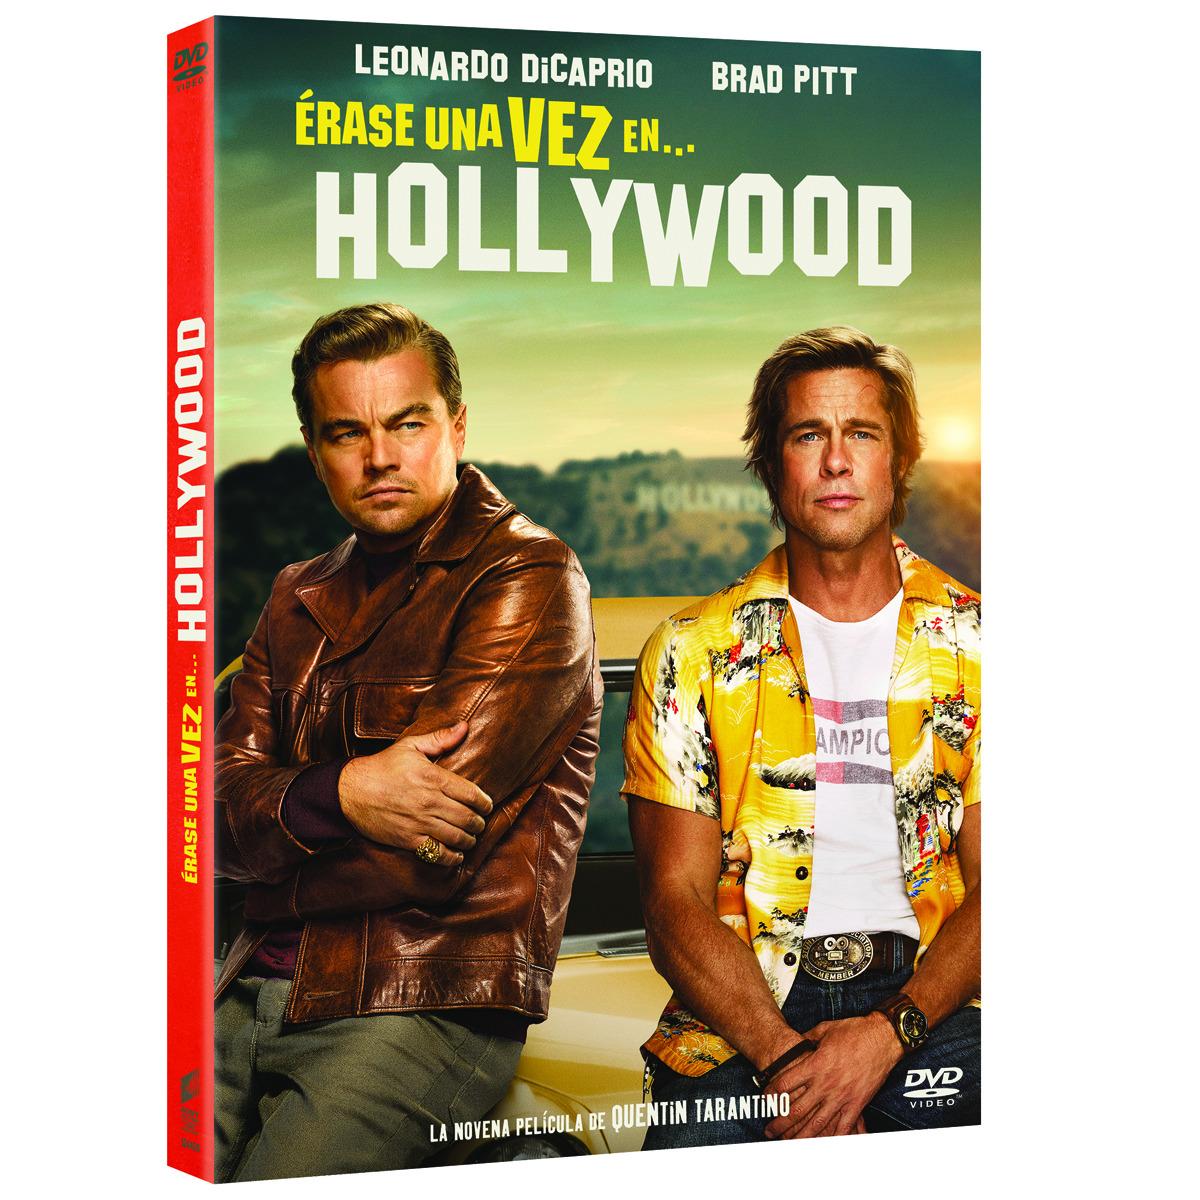 https://www.toledo.es/wp-content/uploads/2020/07/erase.jpg. ÚLTIMAS ADQUISICIONES EN DVD ADULTOS